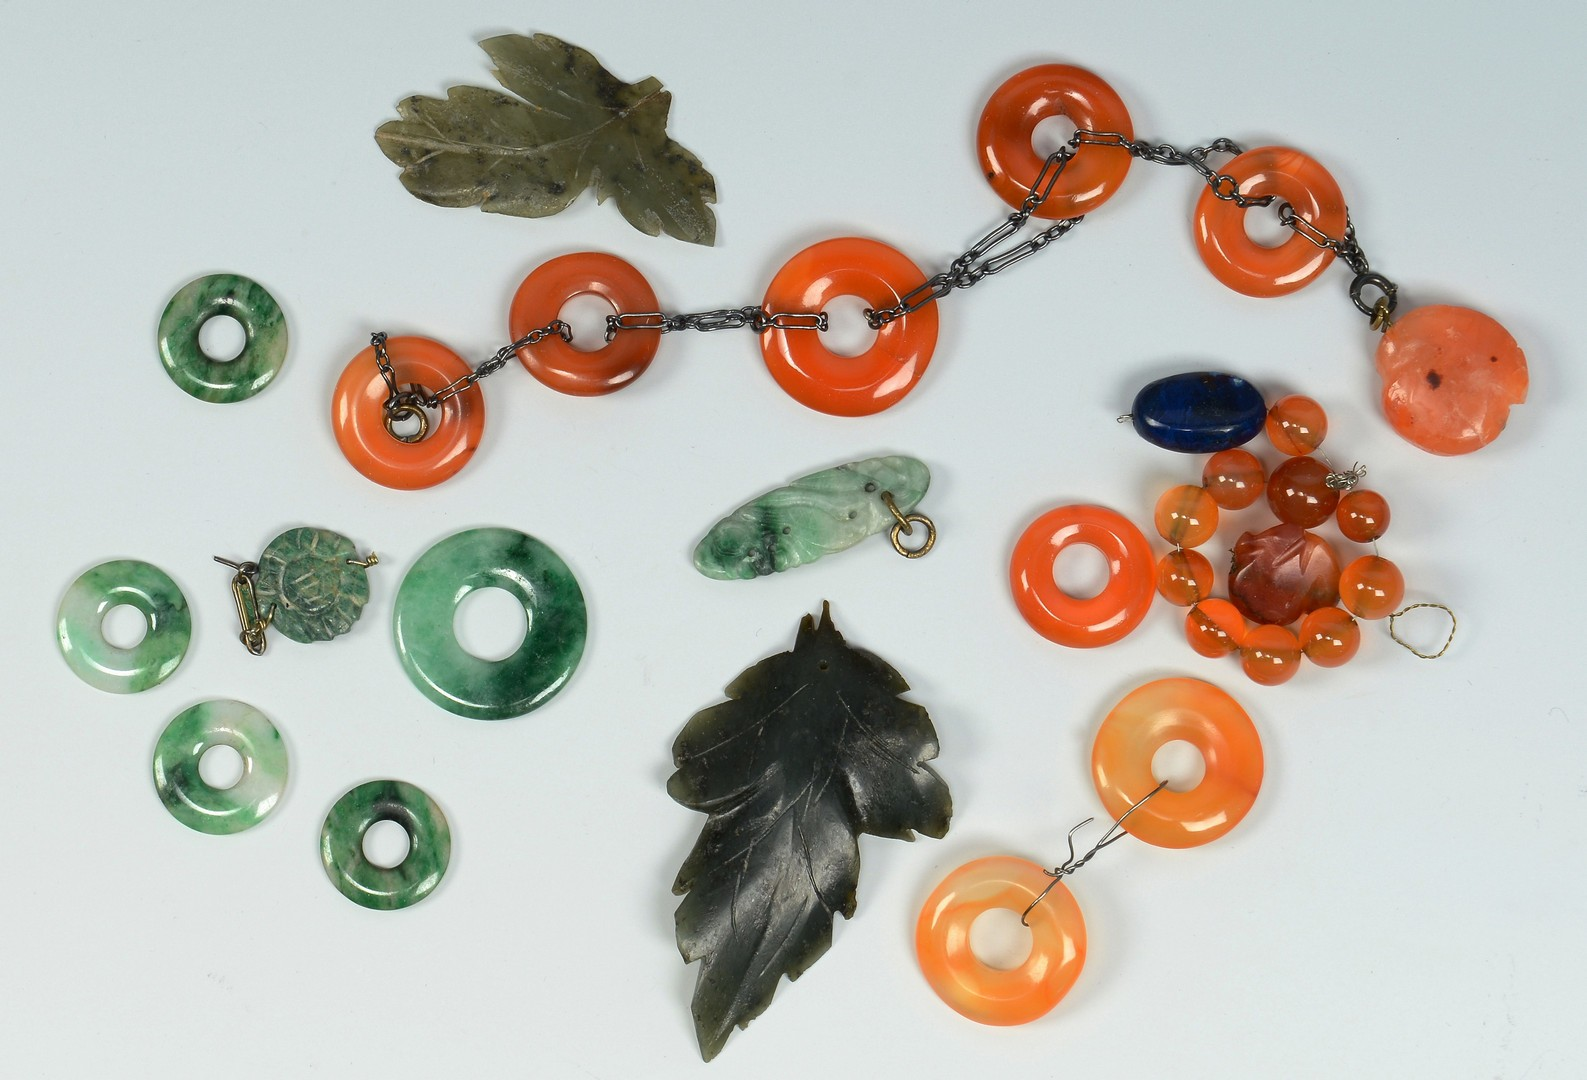 Lot 3383255: Assorted Hardstone Items